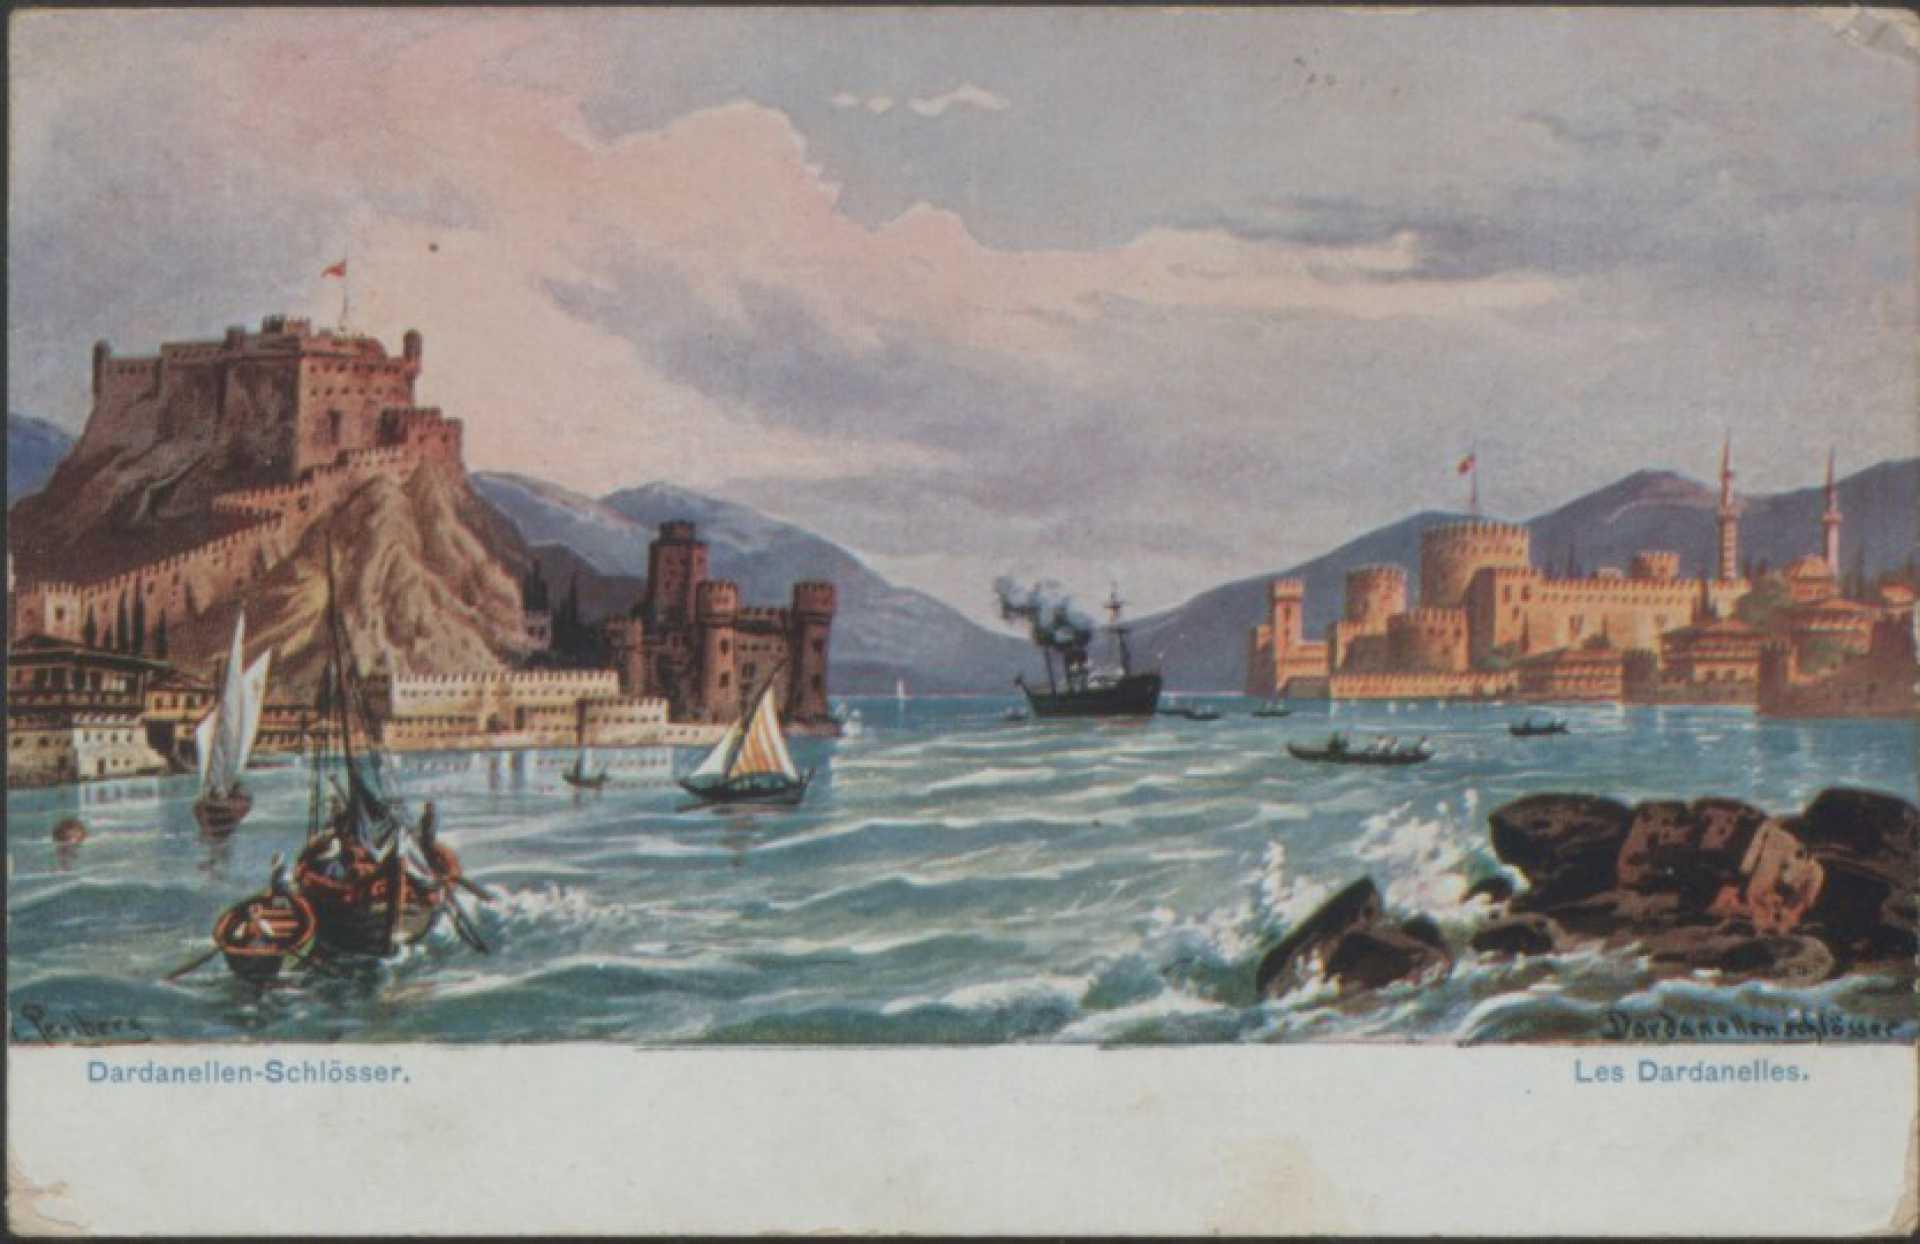 Dardanelles (Canakkale)